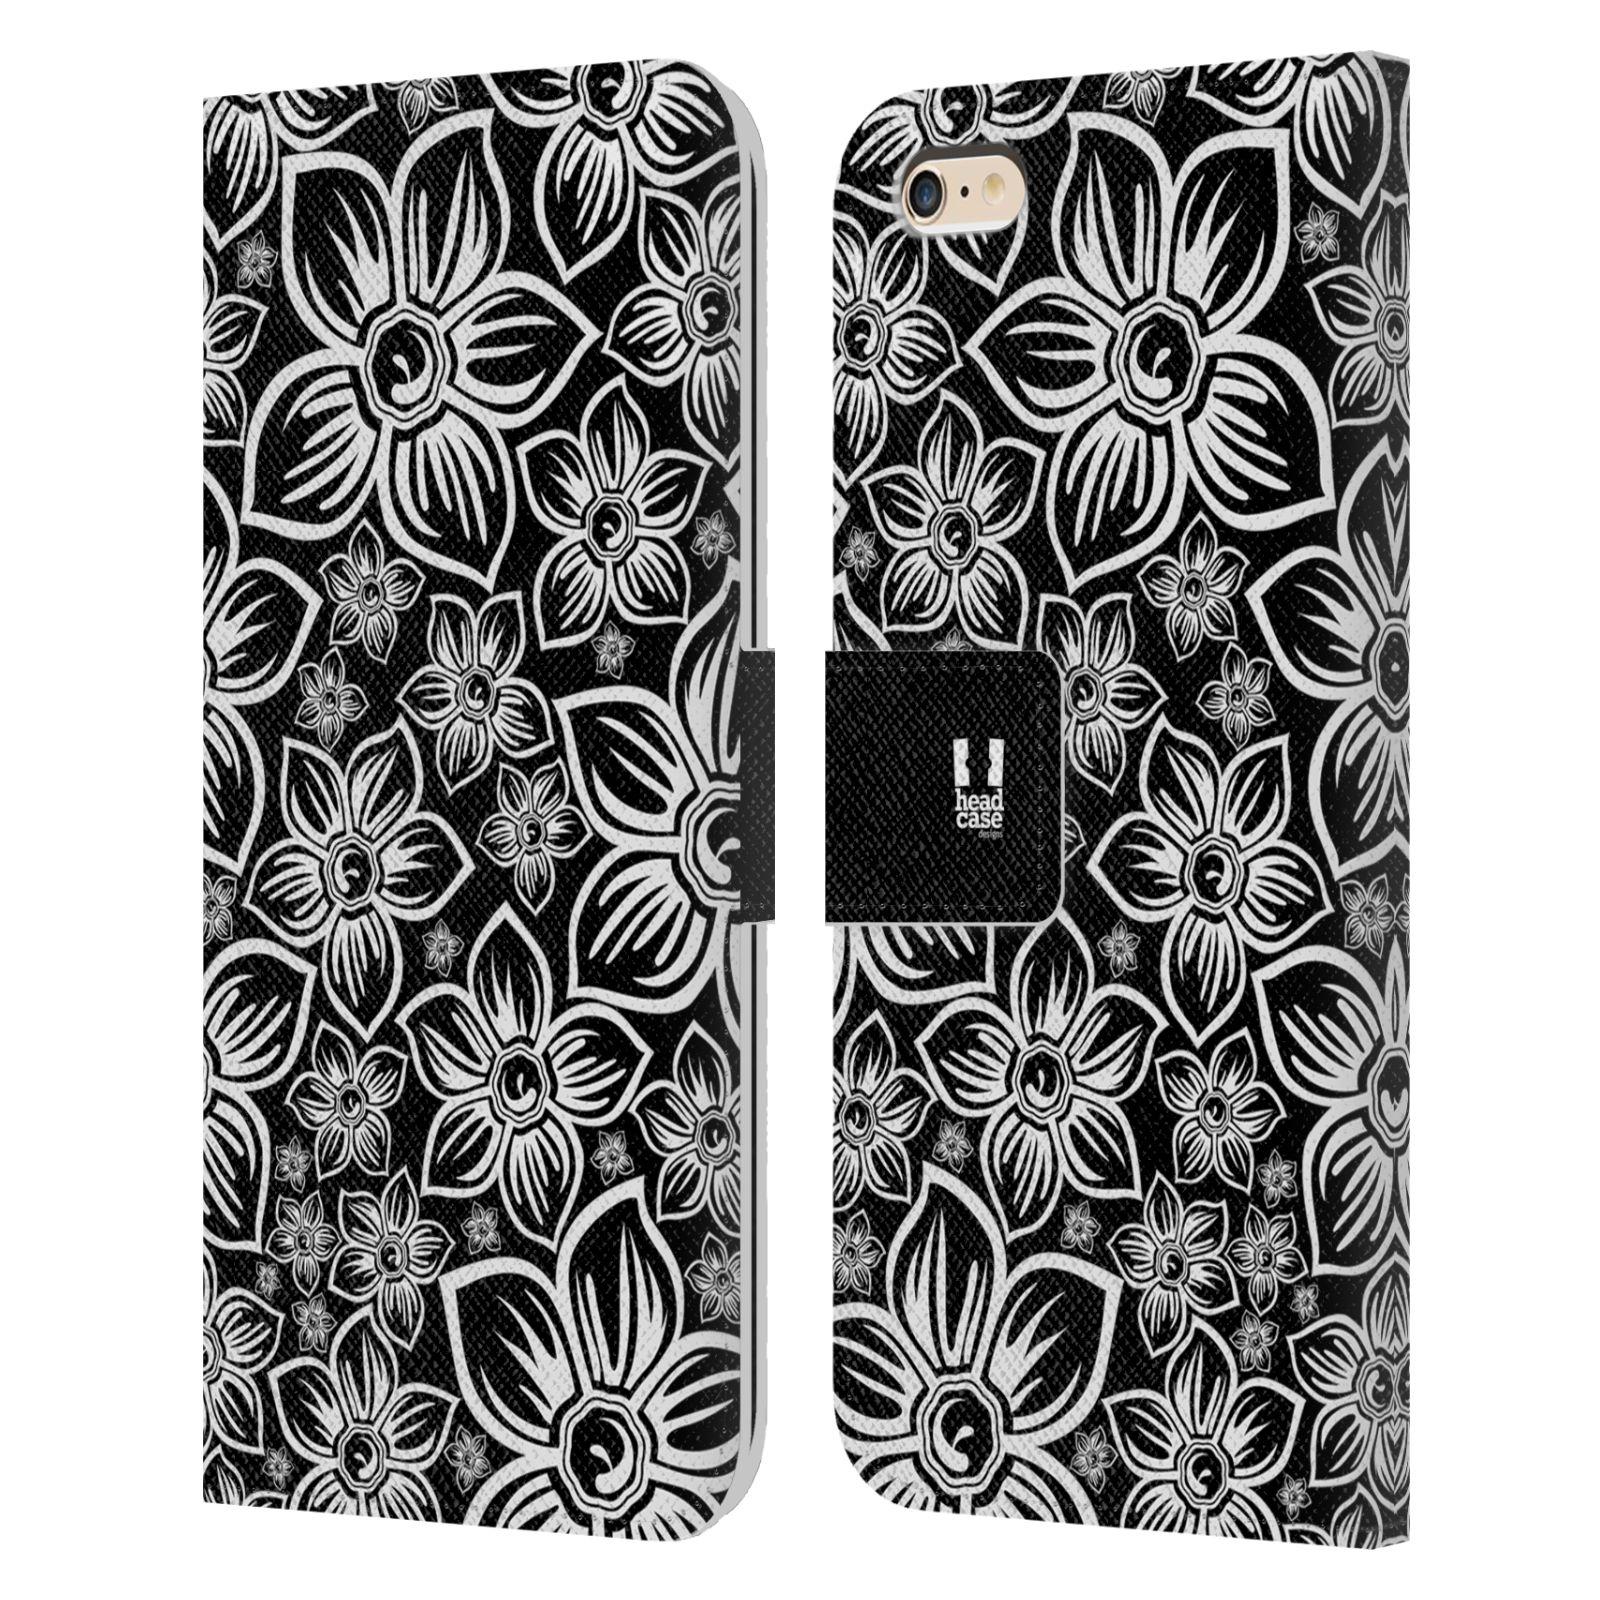 HEAD CASE Flipové pouzdro pro mobil Apple Iphone 6 PLUS / 6S PLUS ČERNOBÍLÁ KVĚTINA sedmikráska